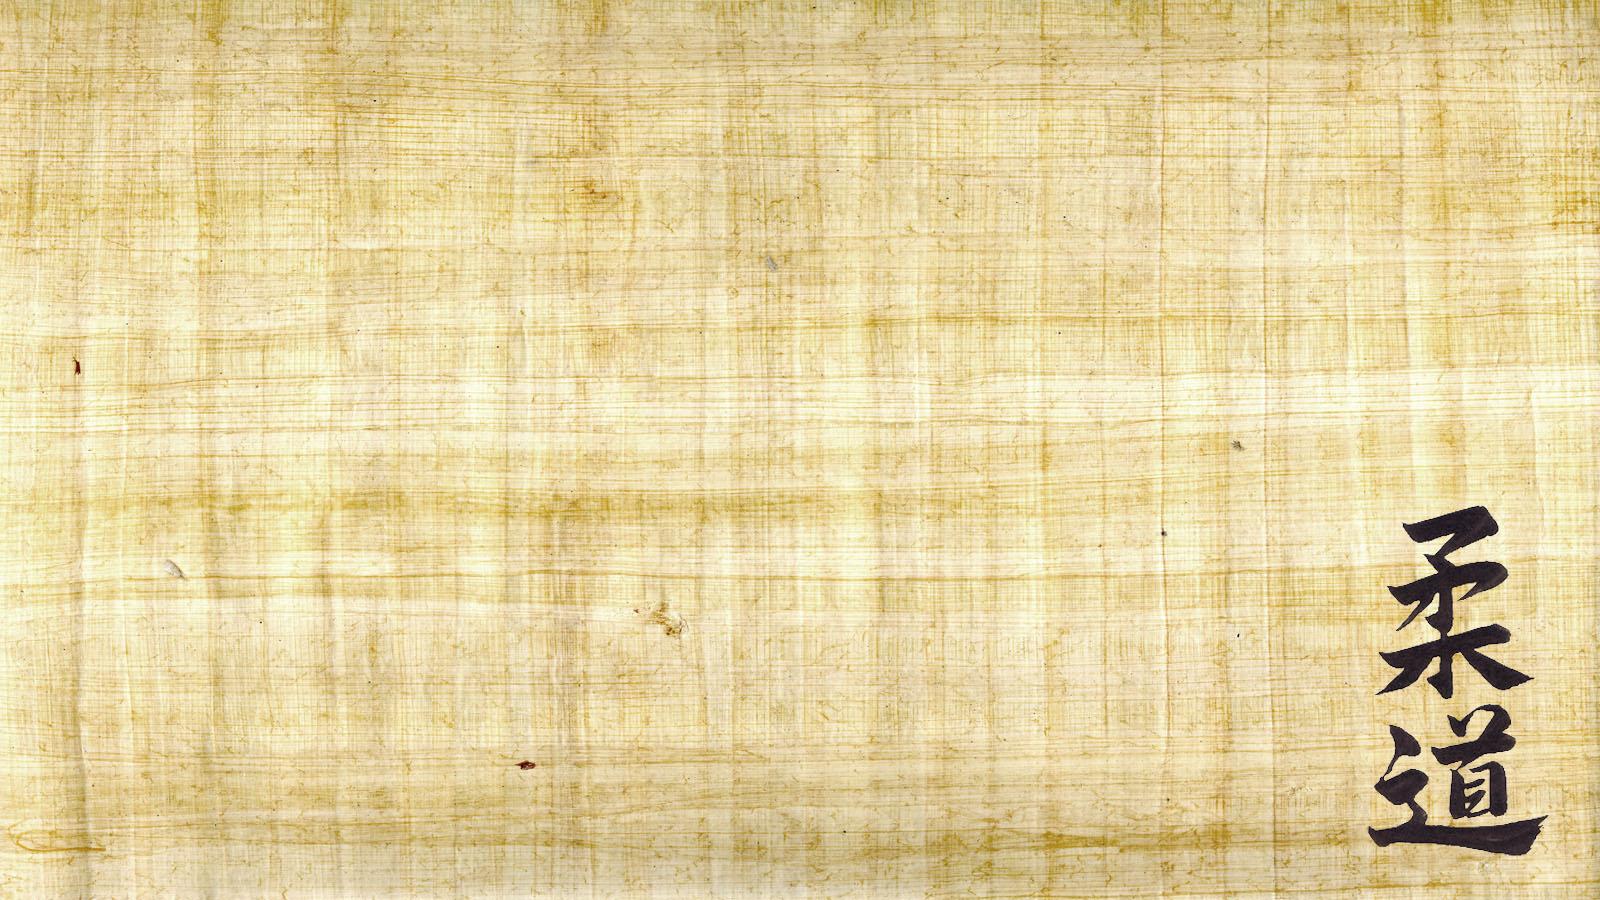 Judo wallpaper by Basthor 1600x900